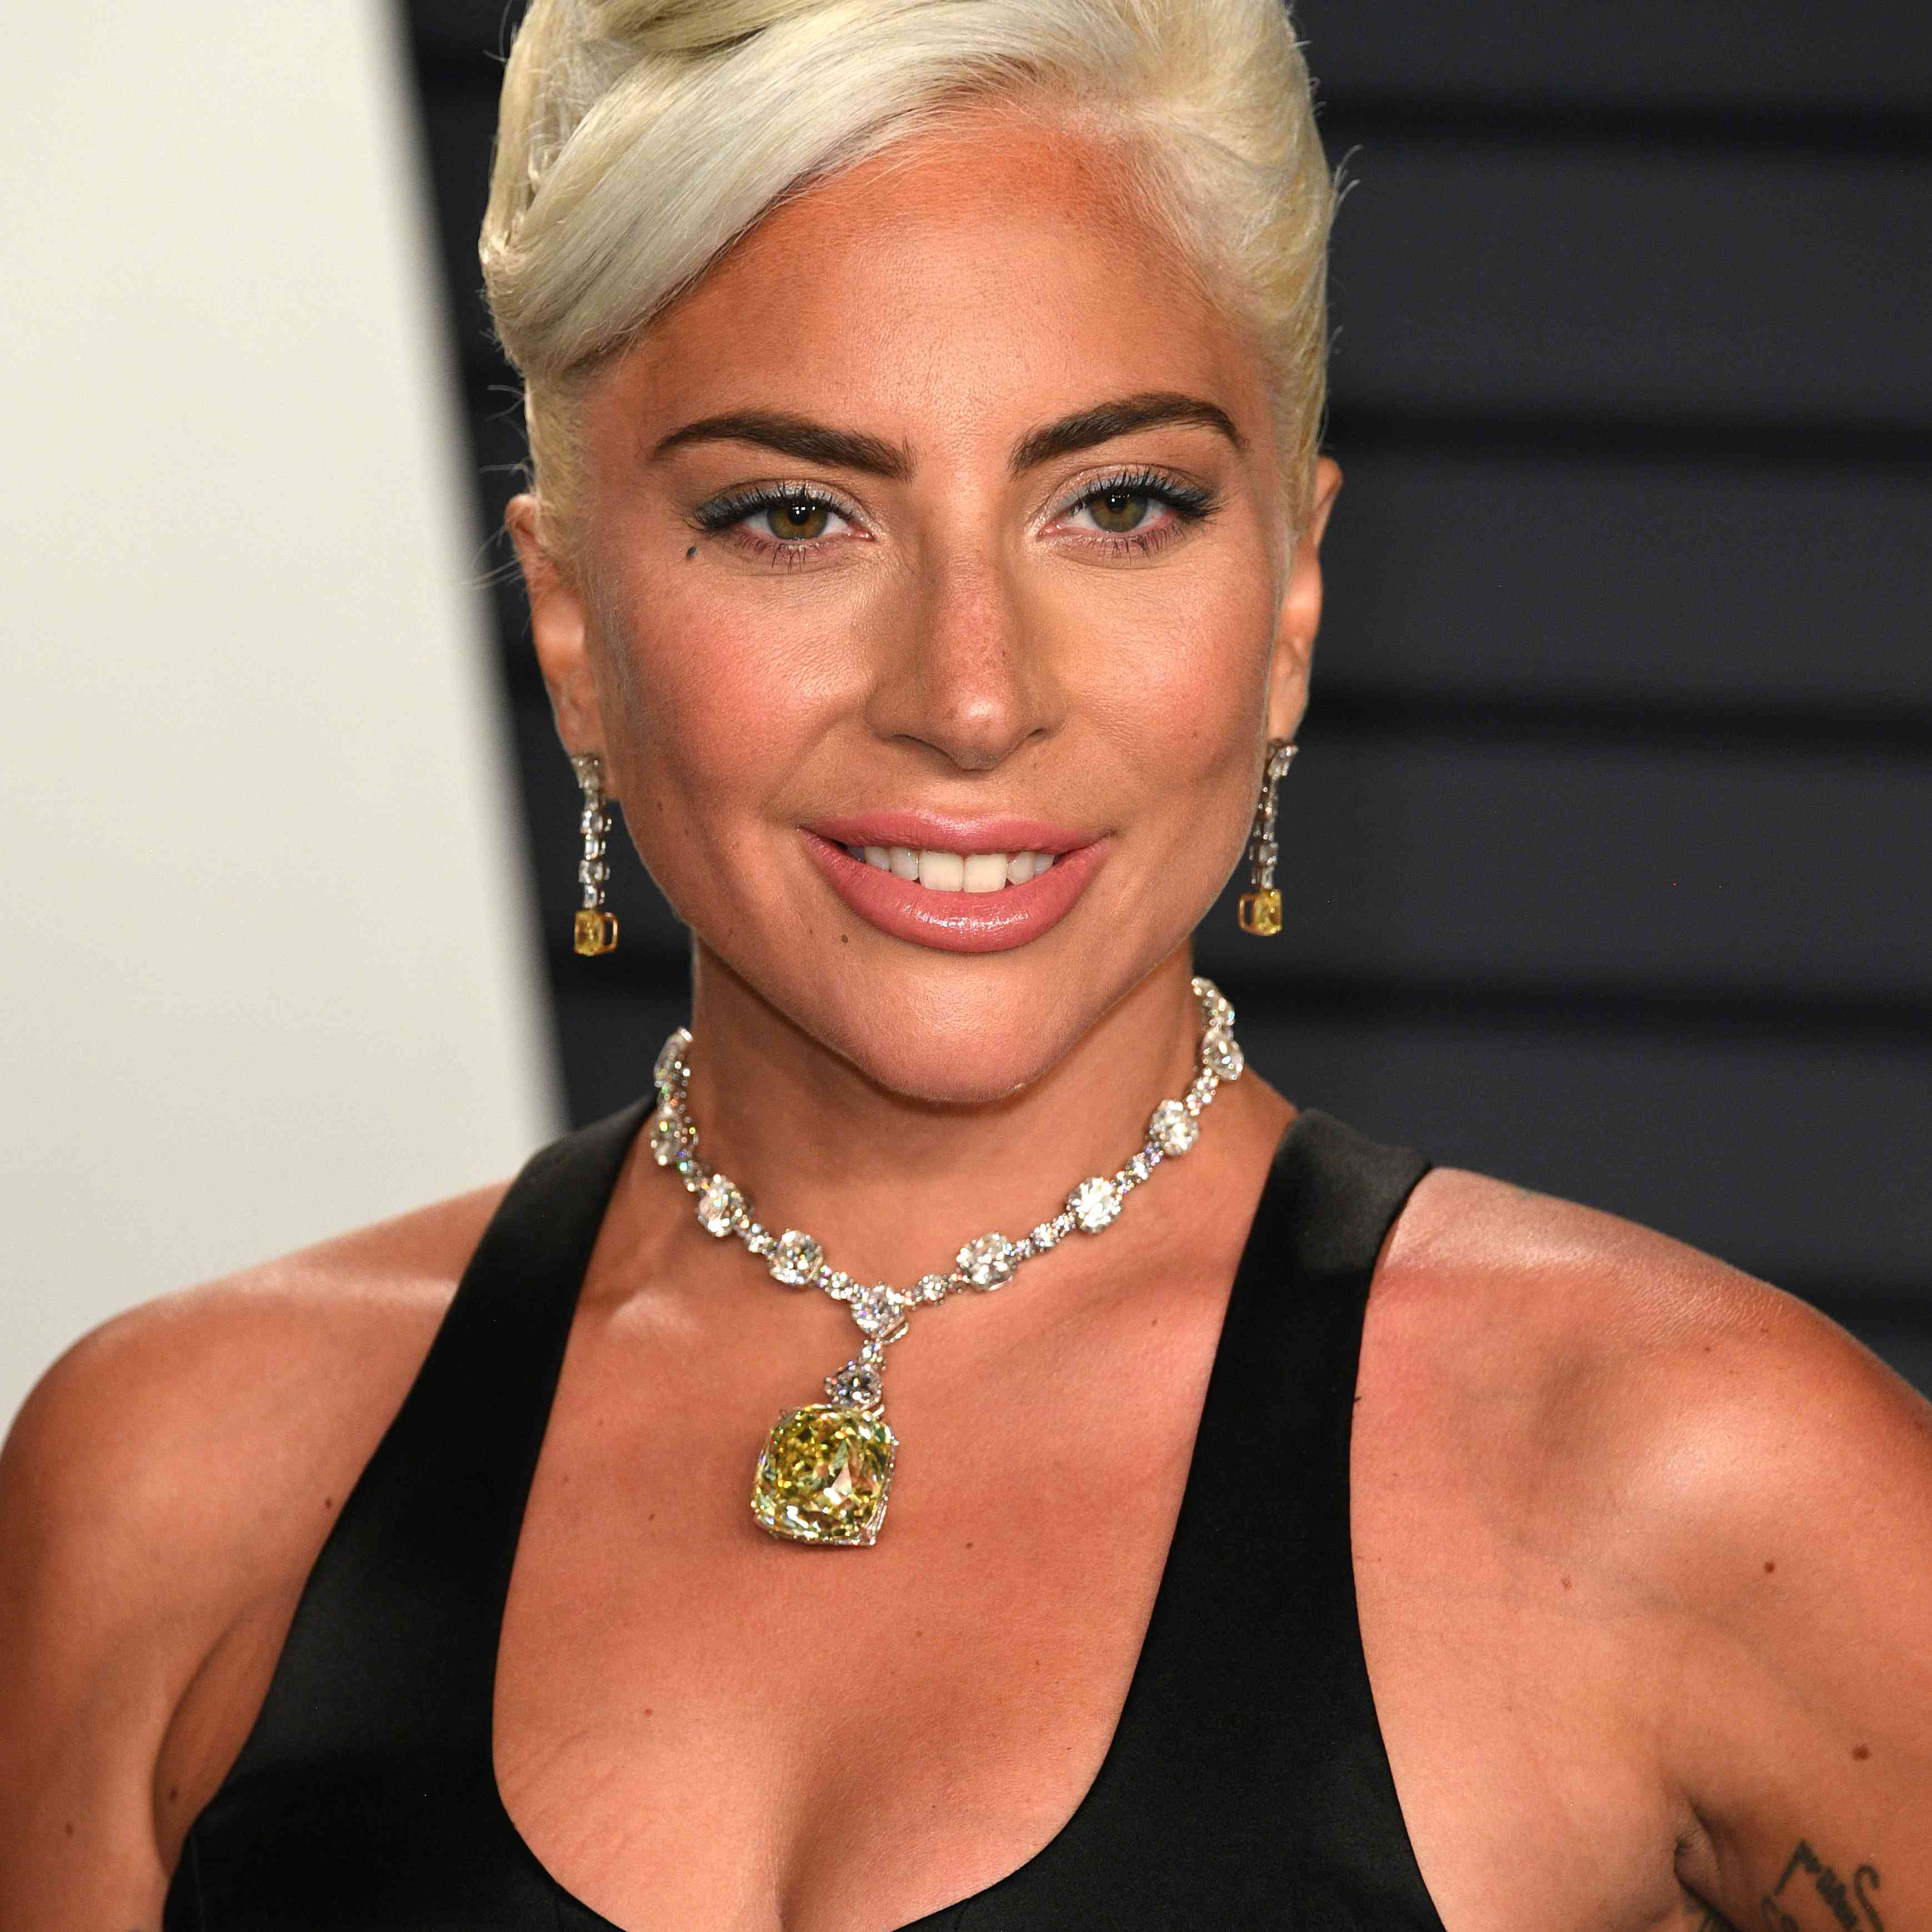 Lady Gaga natural looks